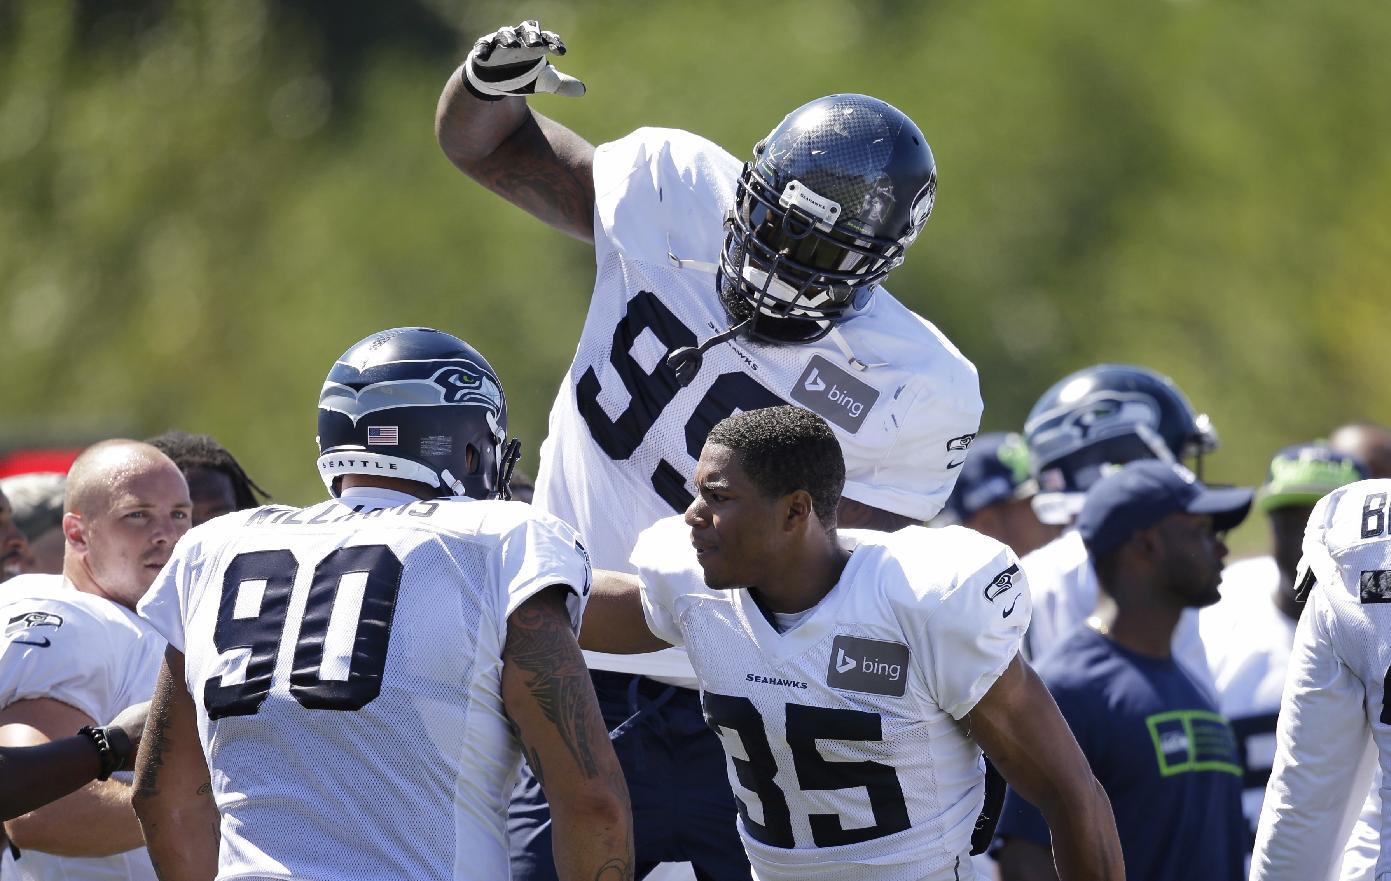 Seattle Seahawks' Tony McDaniel (99) leaps toward teammates Jesse Williams (90) and DeShawn Shead (35) following an NFL football camp practice Tuesday, July 29, 2014, in Renton, Wash. (AP Photo/Elaine Thompson)